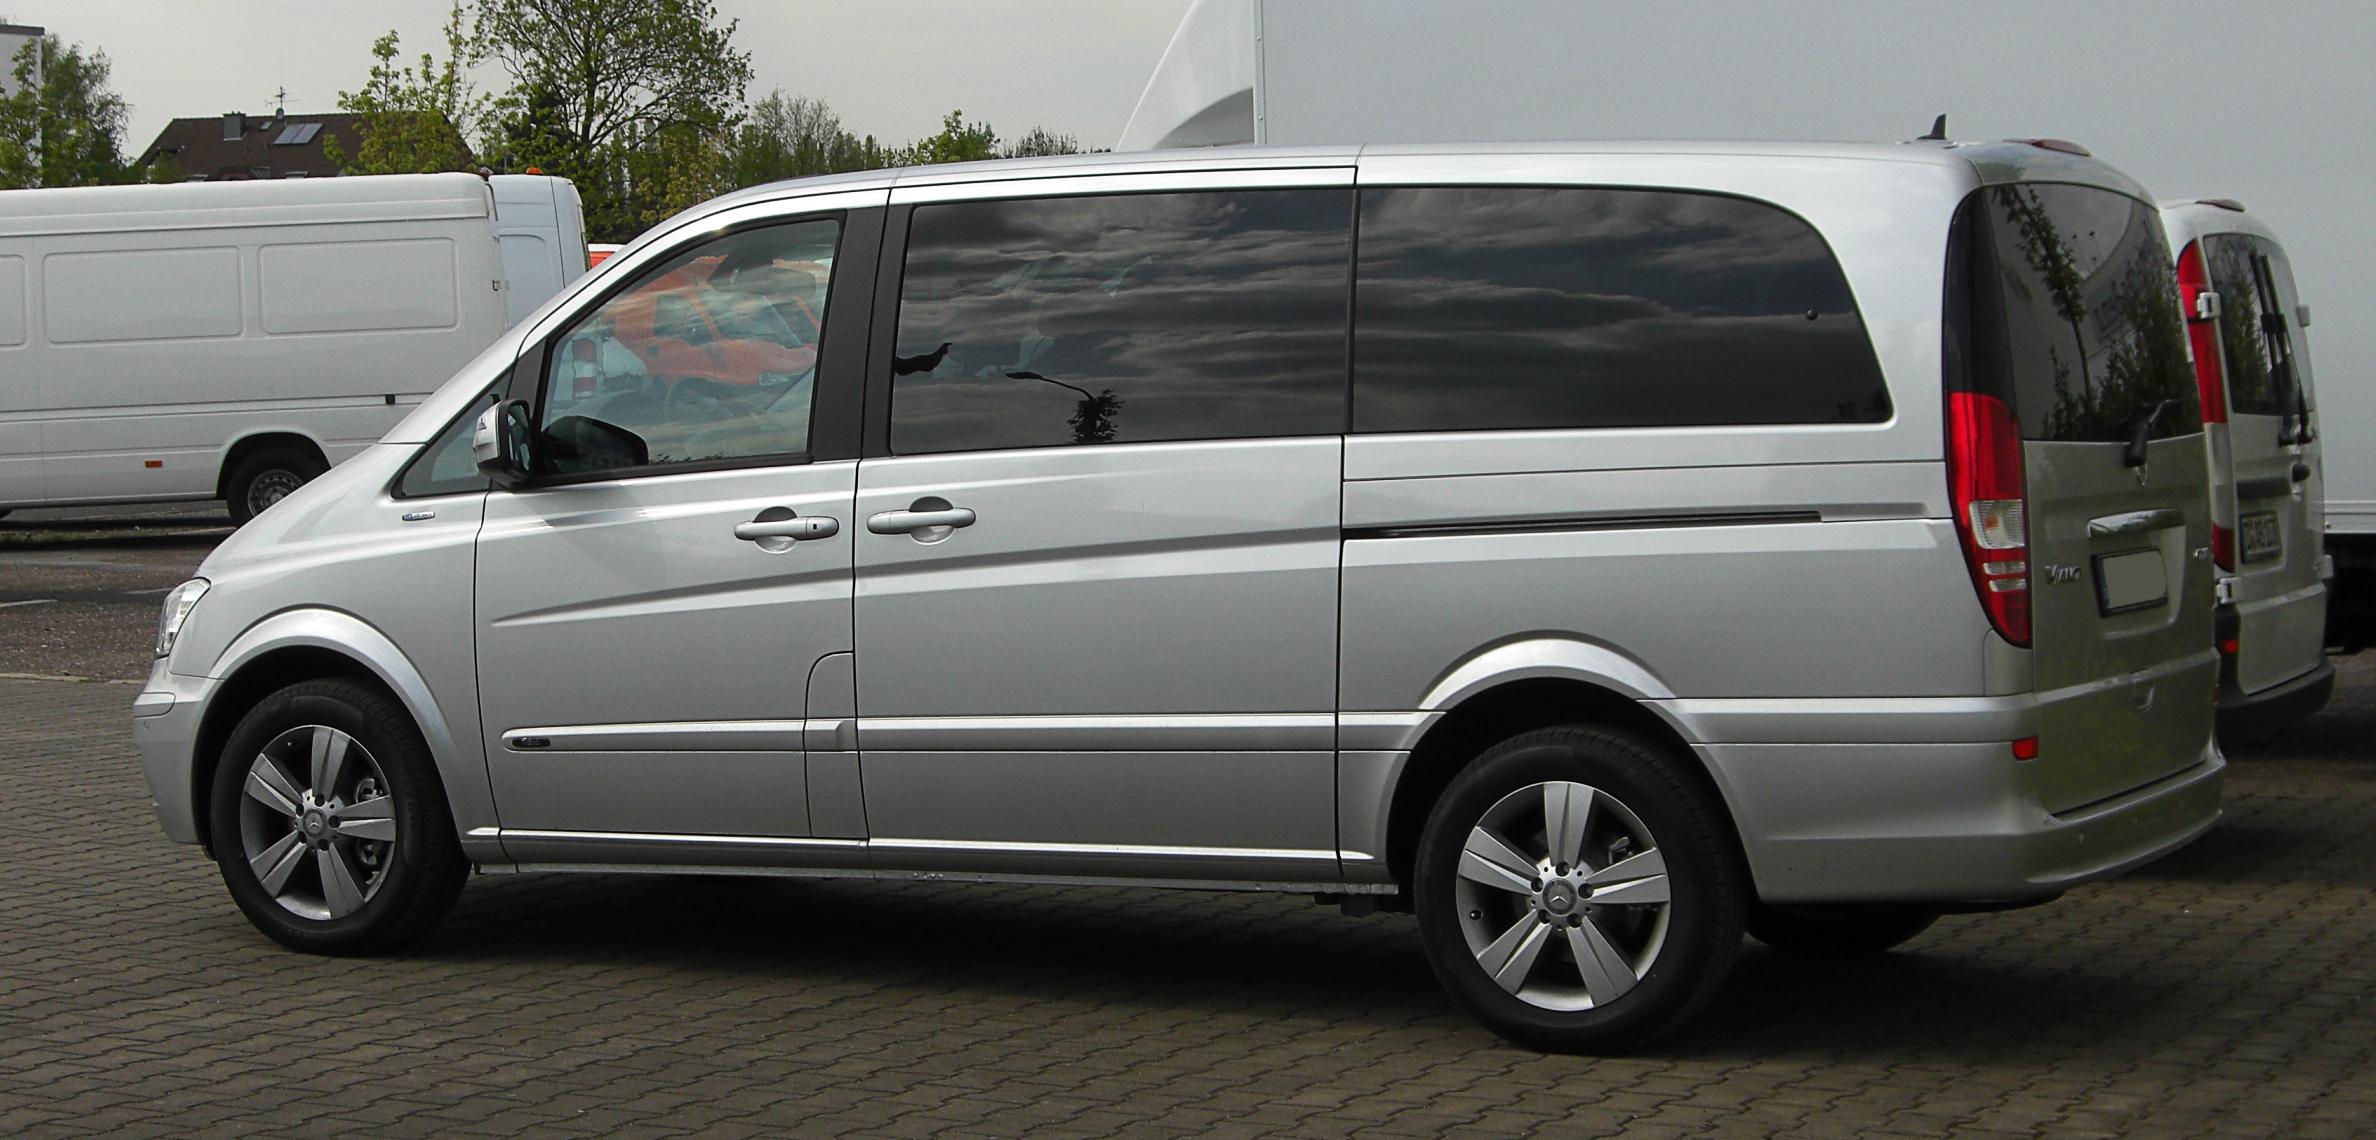 Mercedes-Benz_Viano_Lang_CDI_2.2_